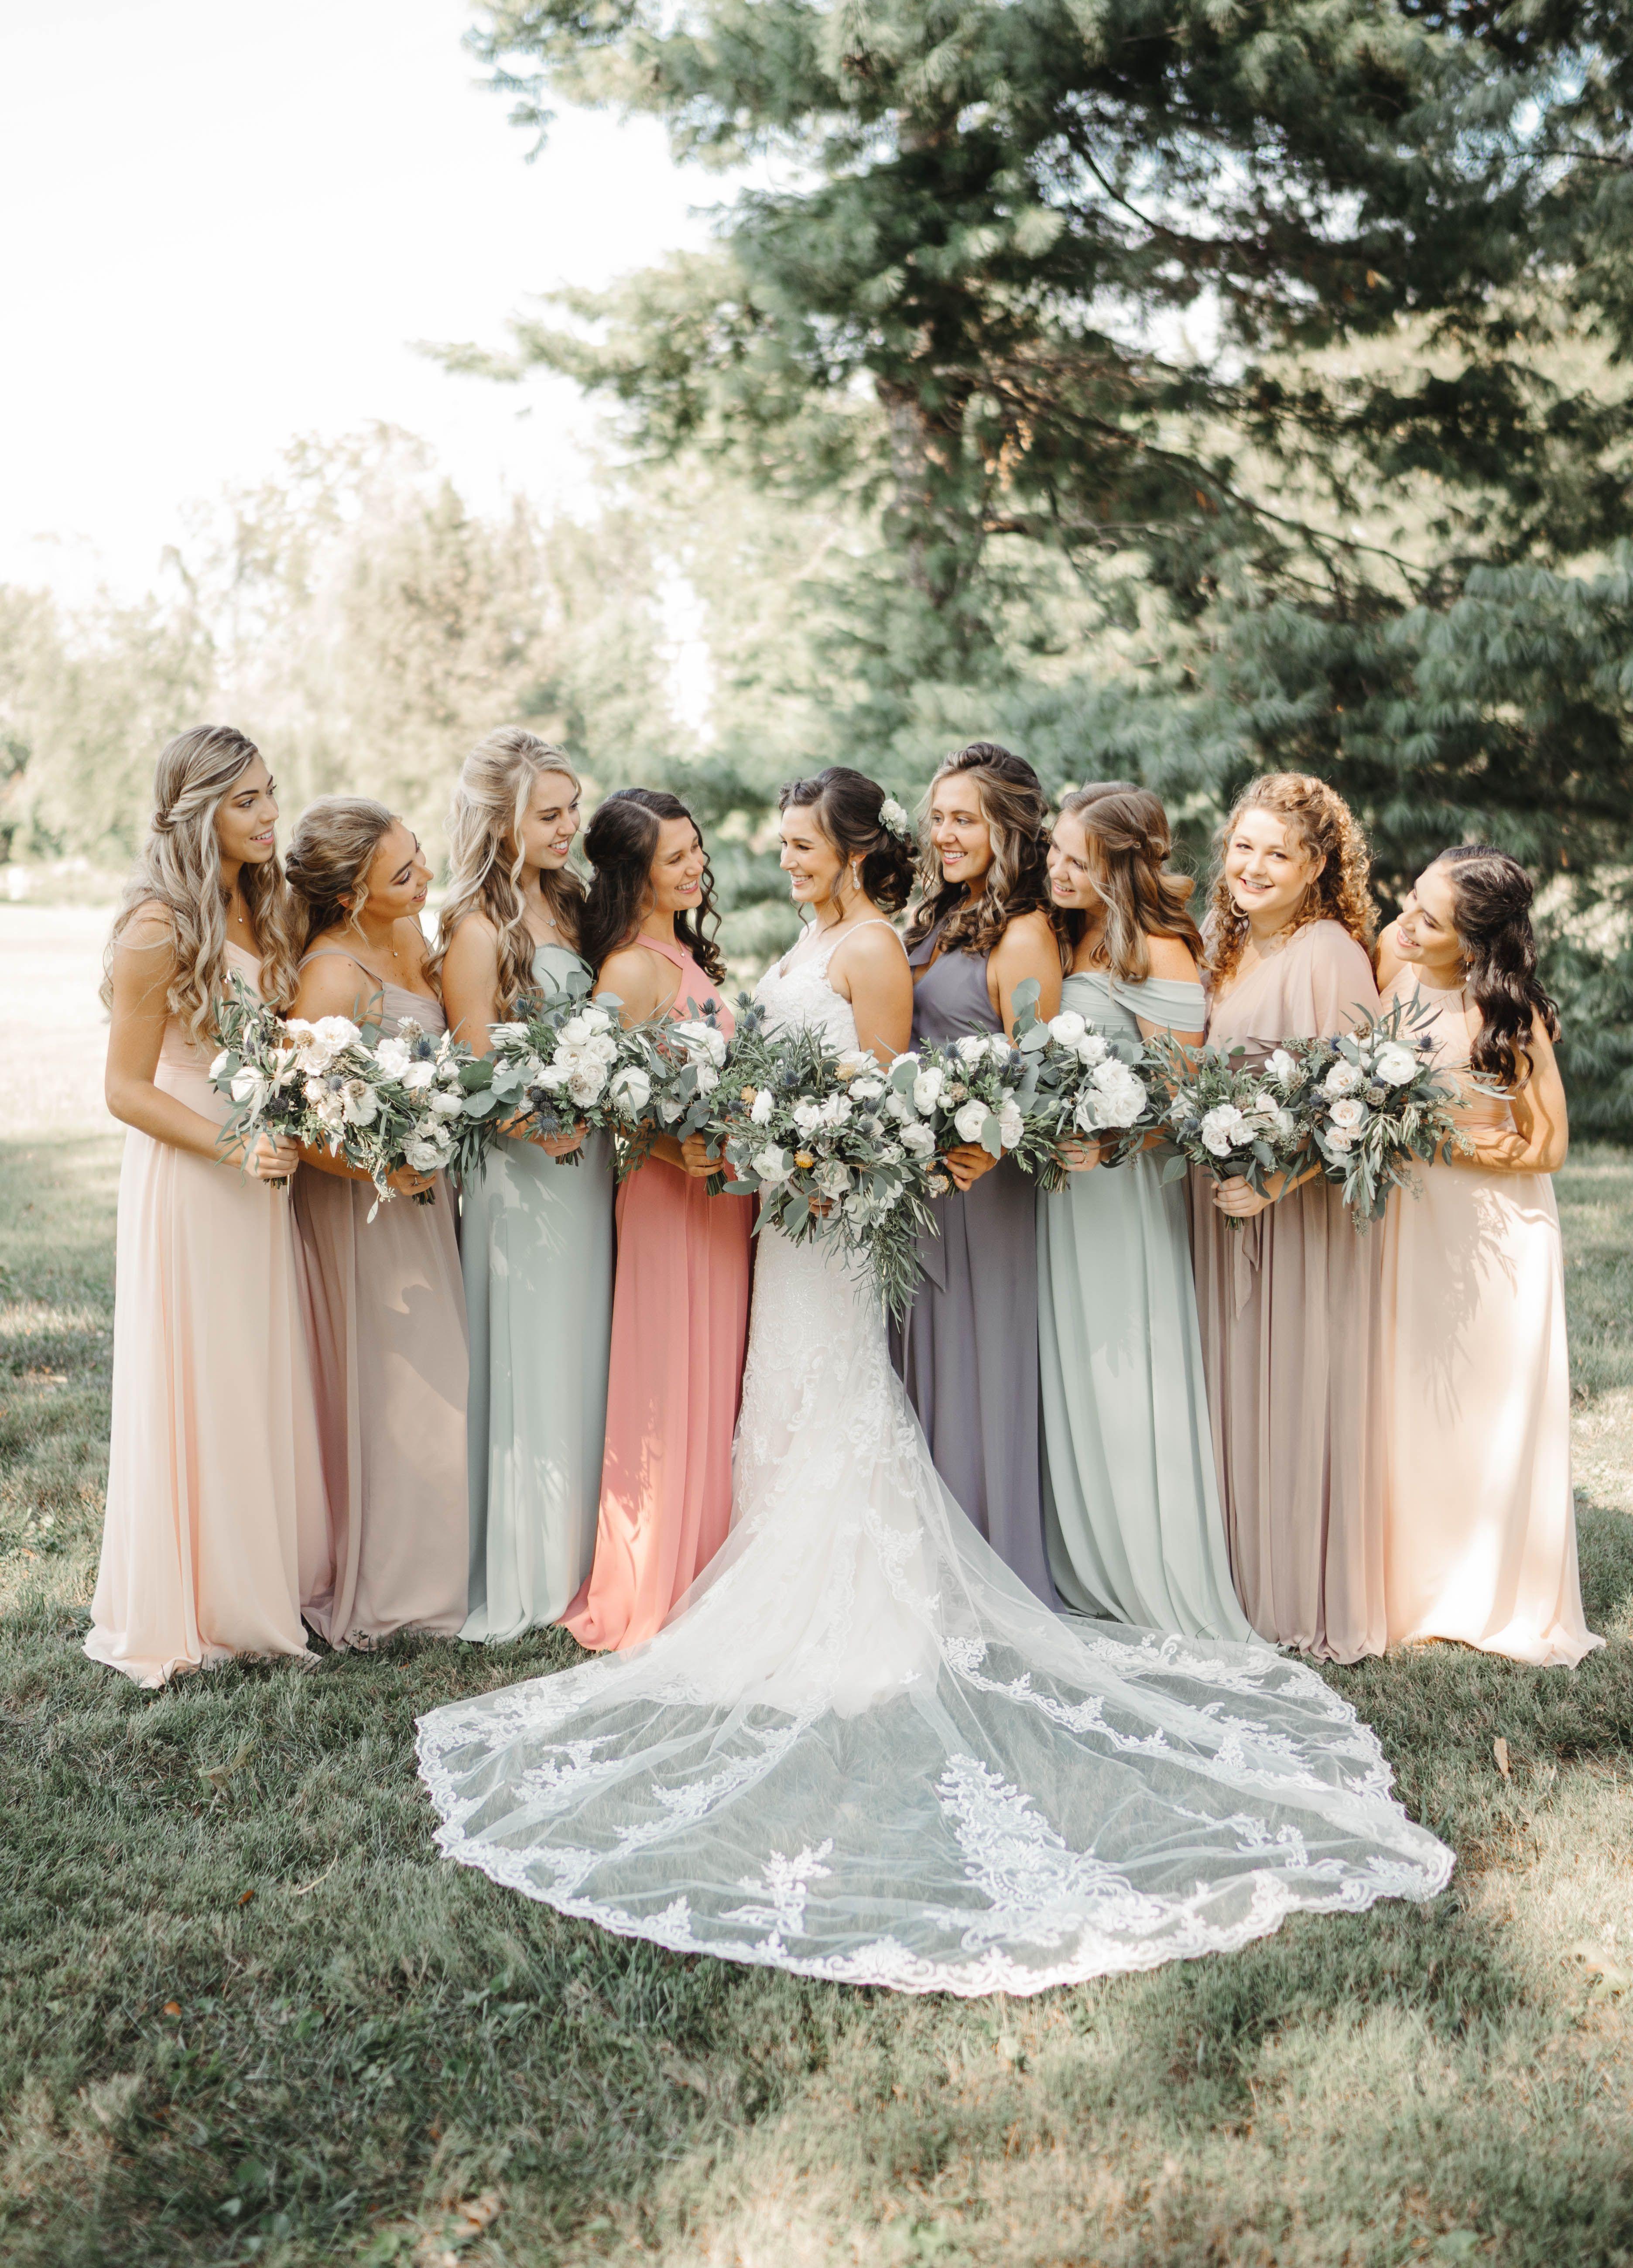 Bridesmaid Dresses For Garden Wedding Dusty Rose Bridesmaid Dresses Pastel Bridesmaid Dresses Rose Bridesmaid Dresses